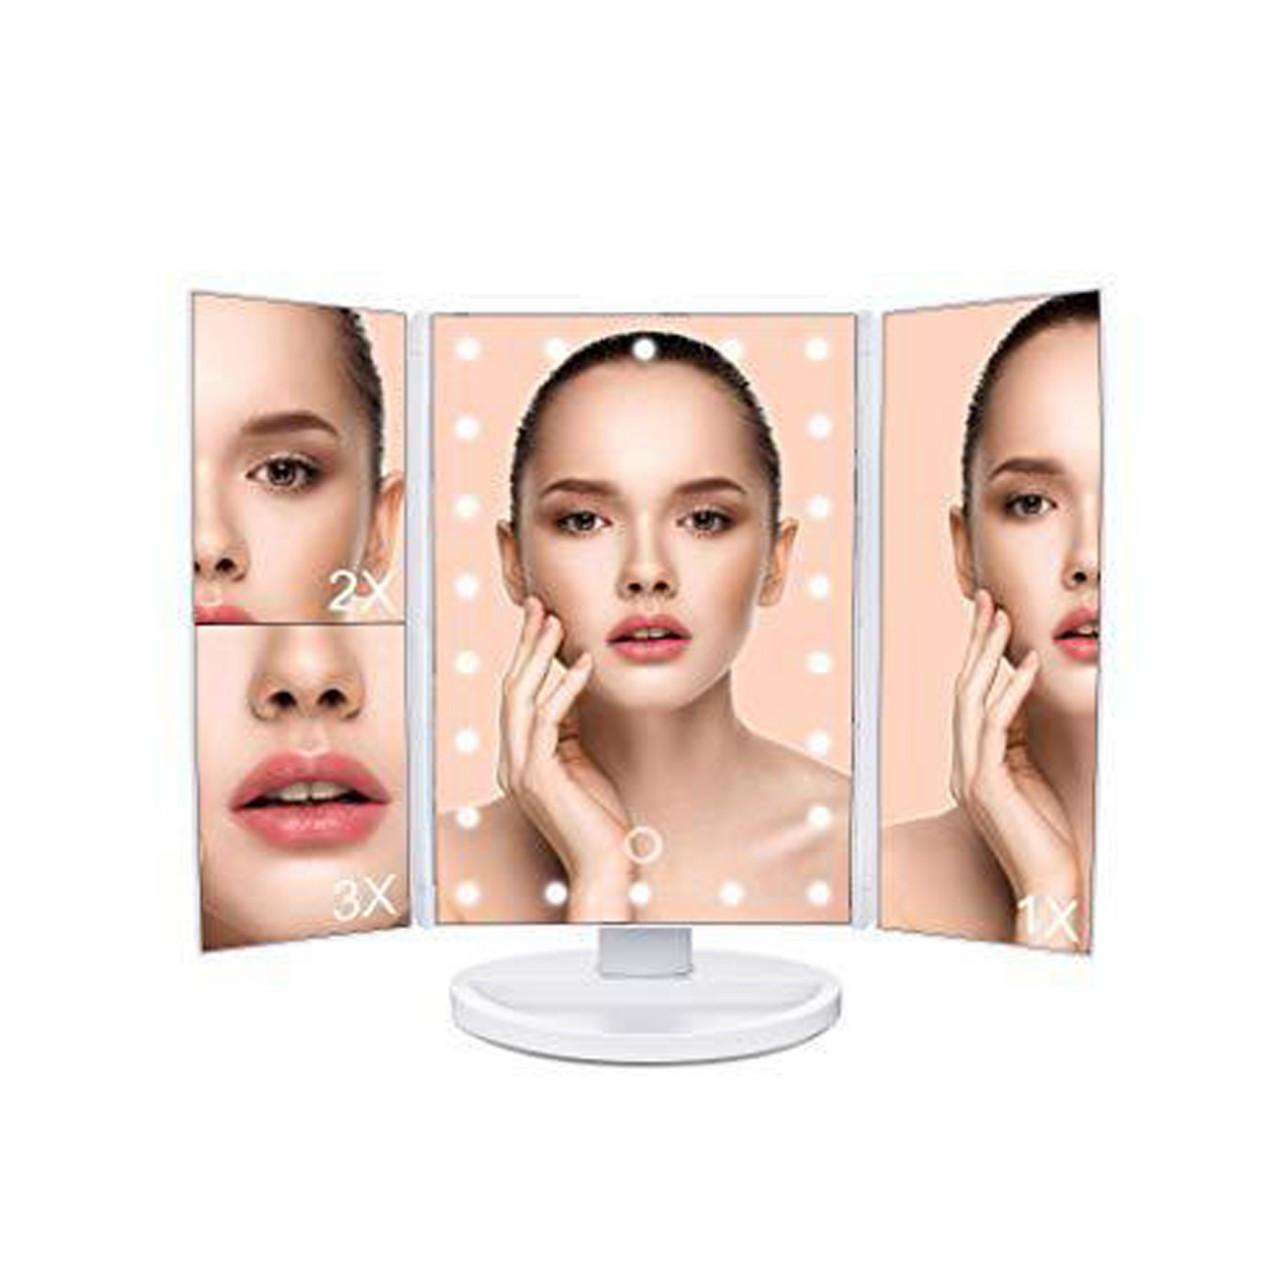 LED Дзеркало з підсвічуванням для макіяжу Superstar Magnifying Mirror Опт